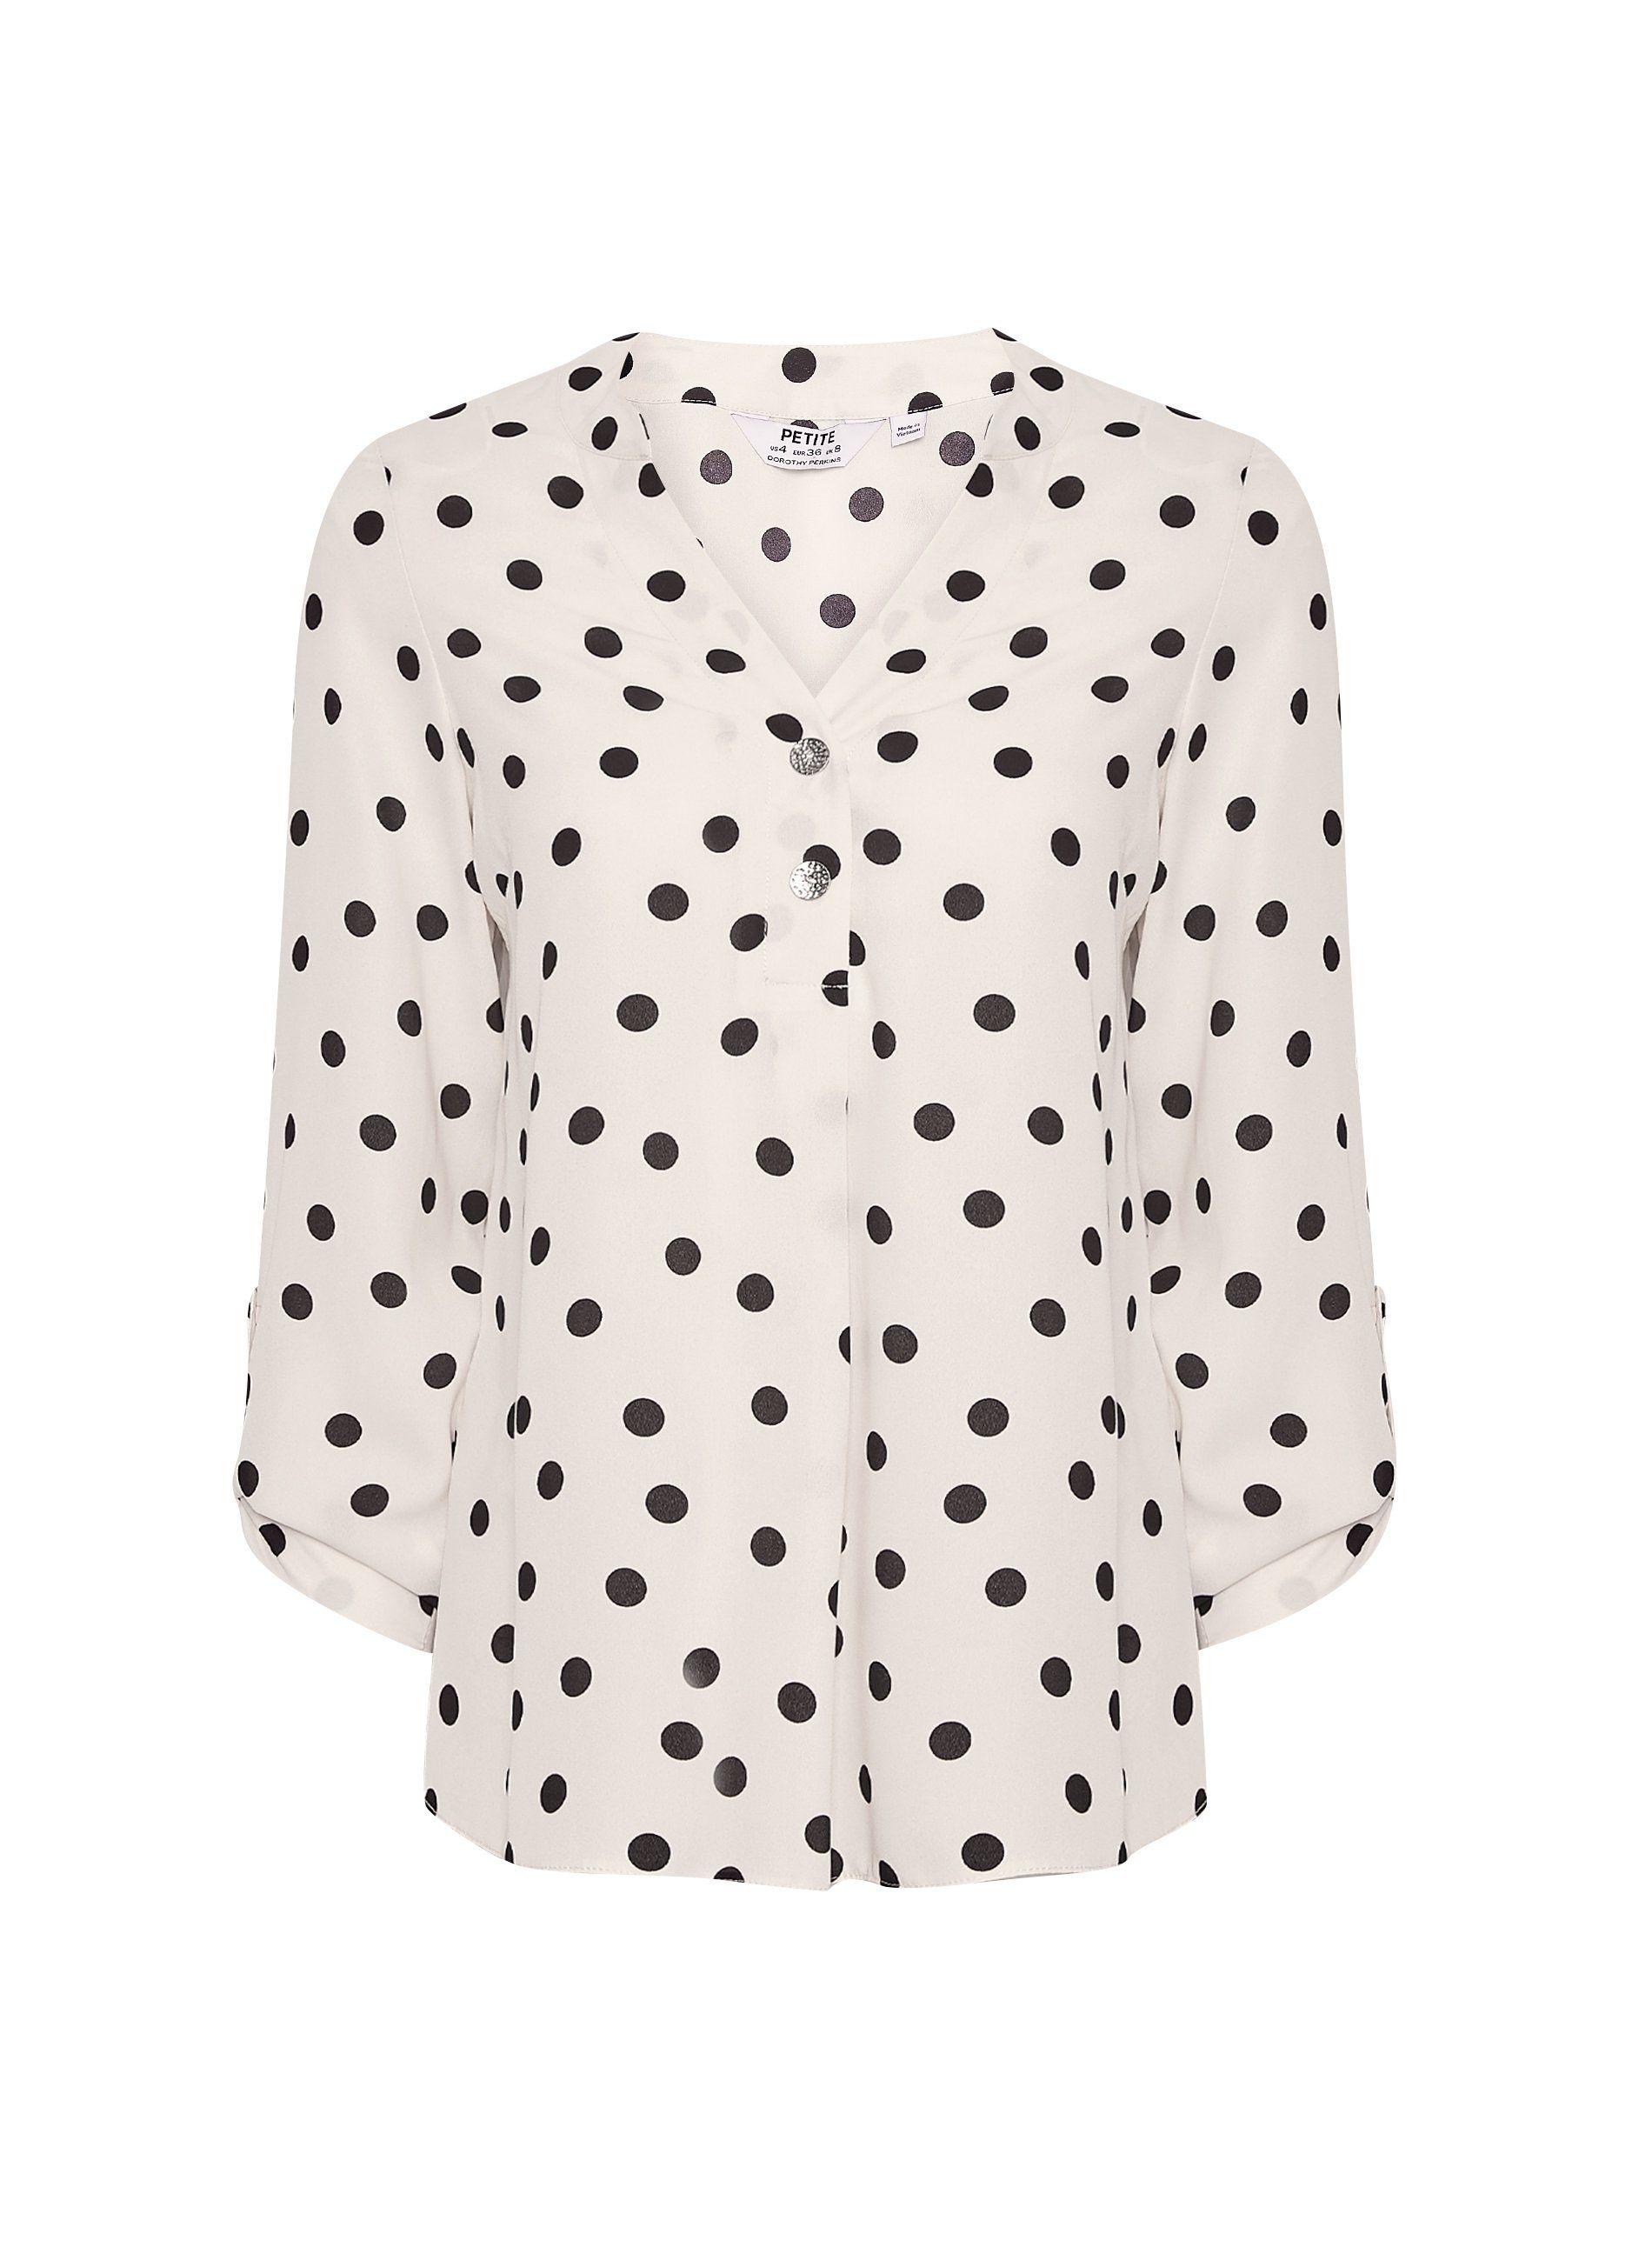 Dorothy Perkins Womens Petite Ivory Spot Print Roll Sleeve Shirt Blouse Top